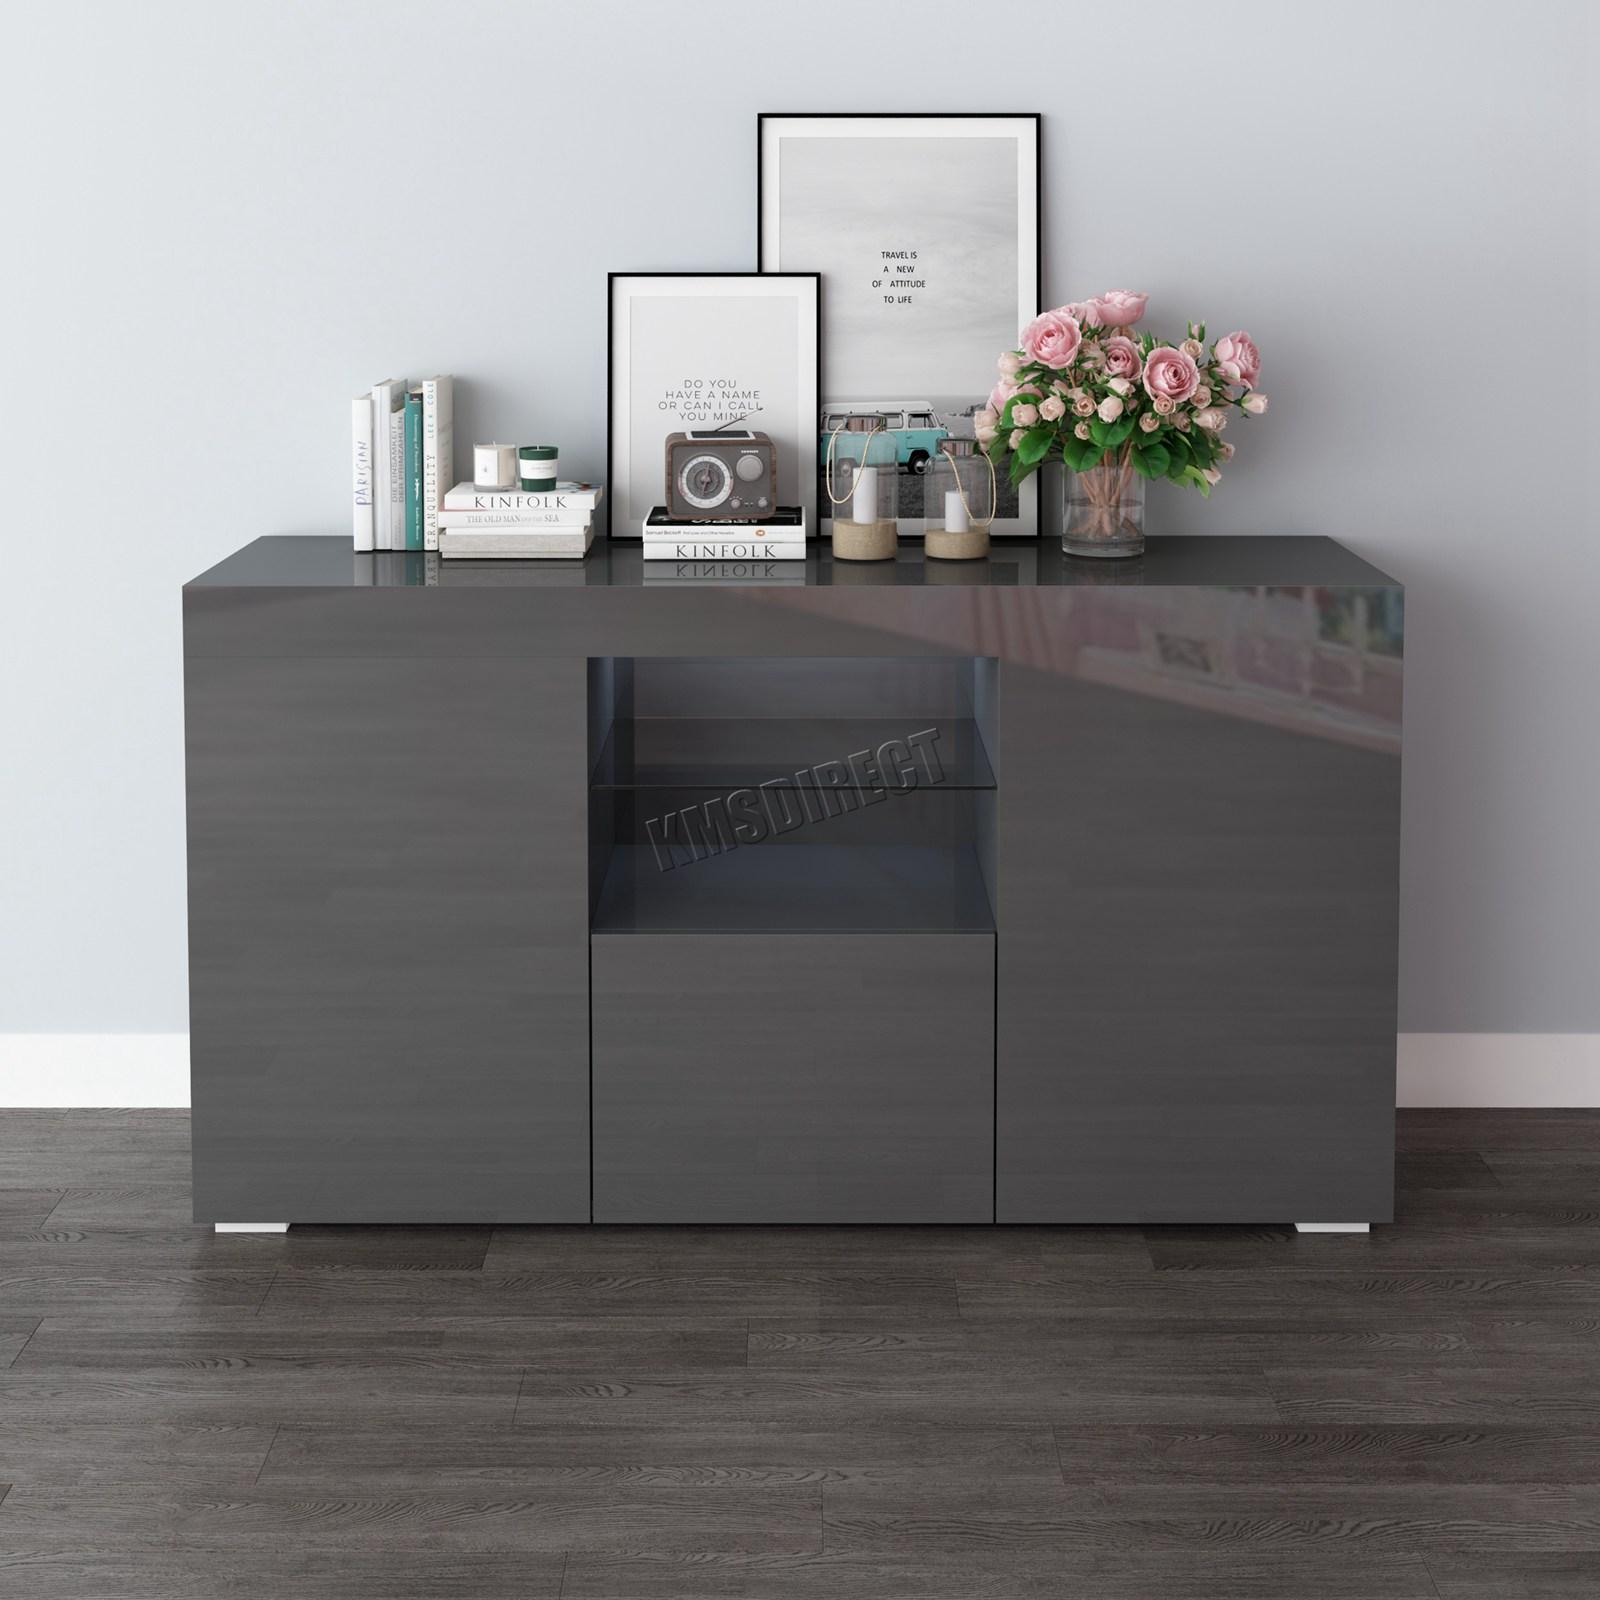 WestWood-PB-High-Gloss-Cabinet-LED-Bookshelf-Sideboard-Cupboard-Home-Unit-PHC03 thumbnail 22